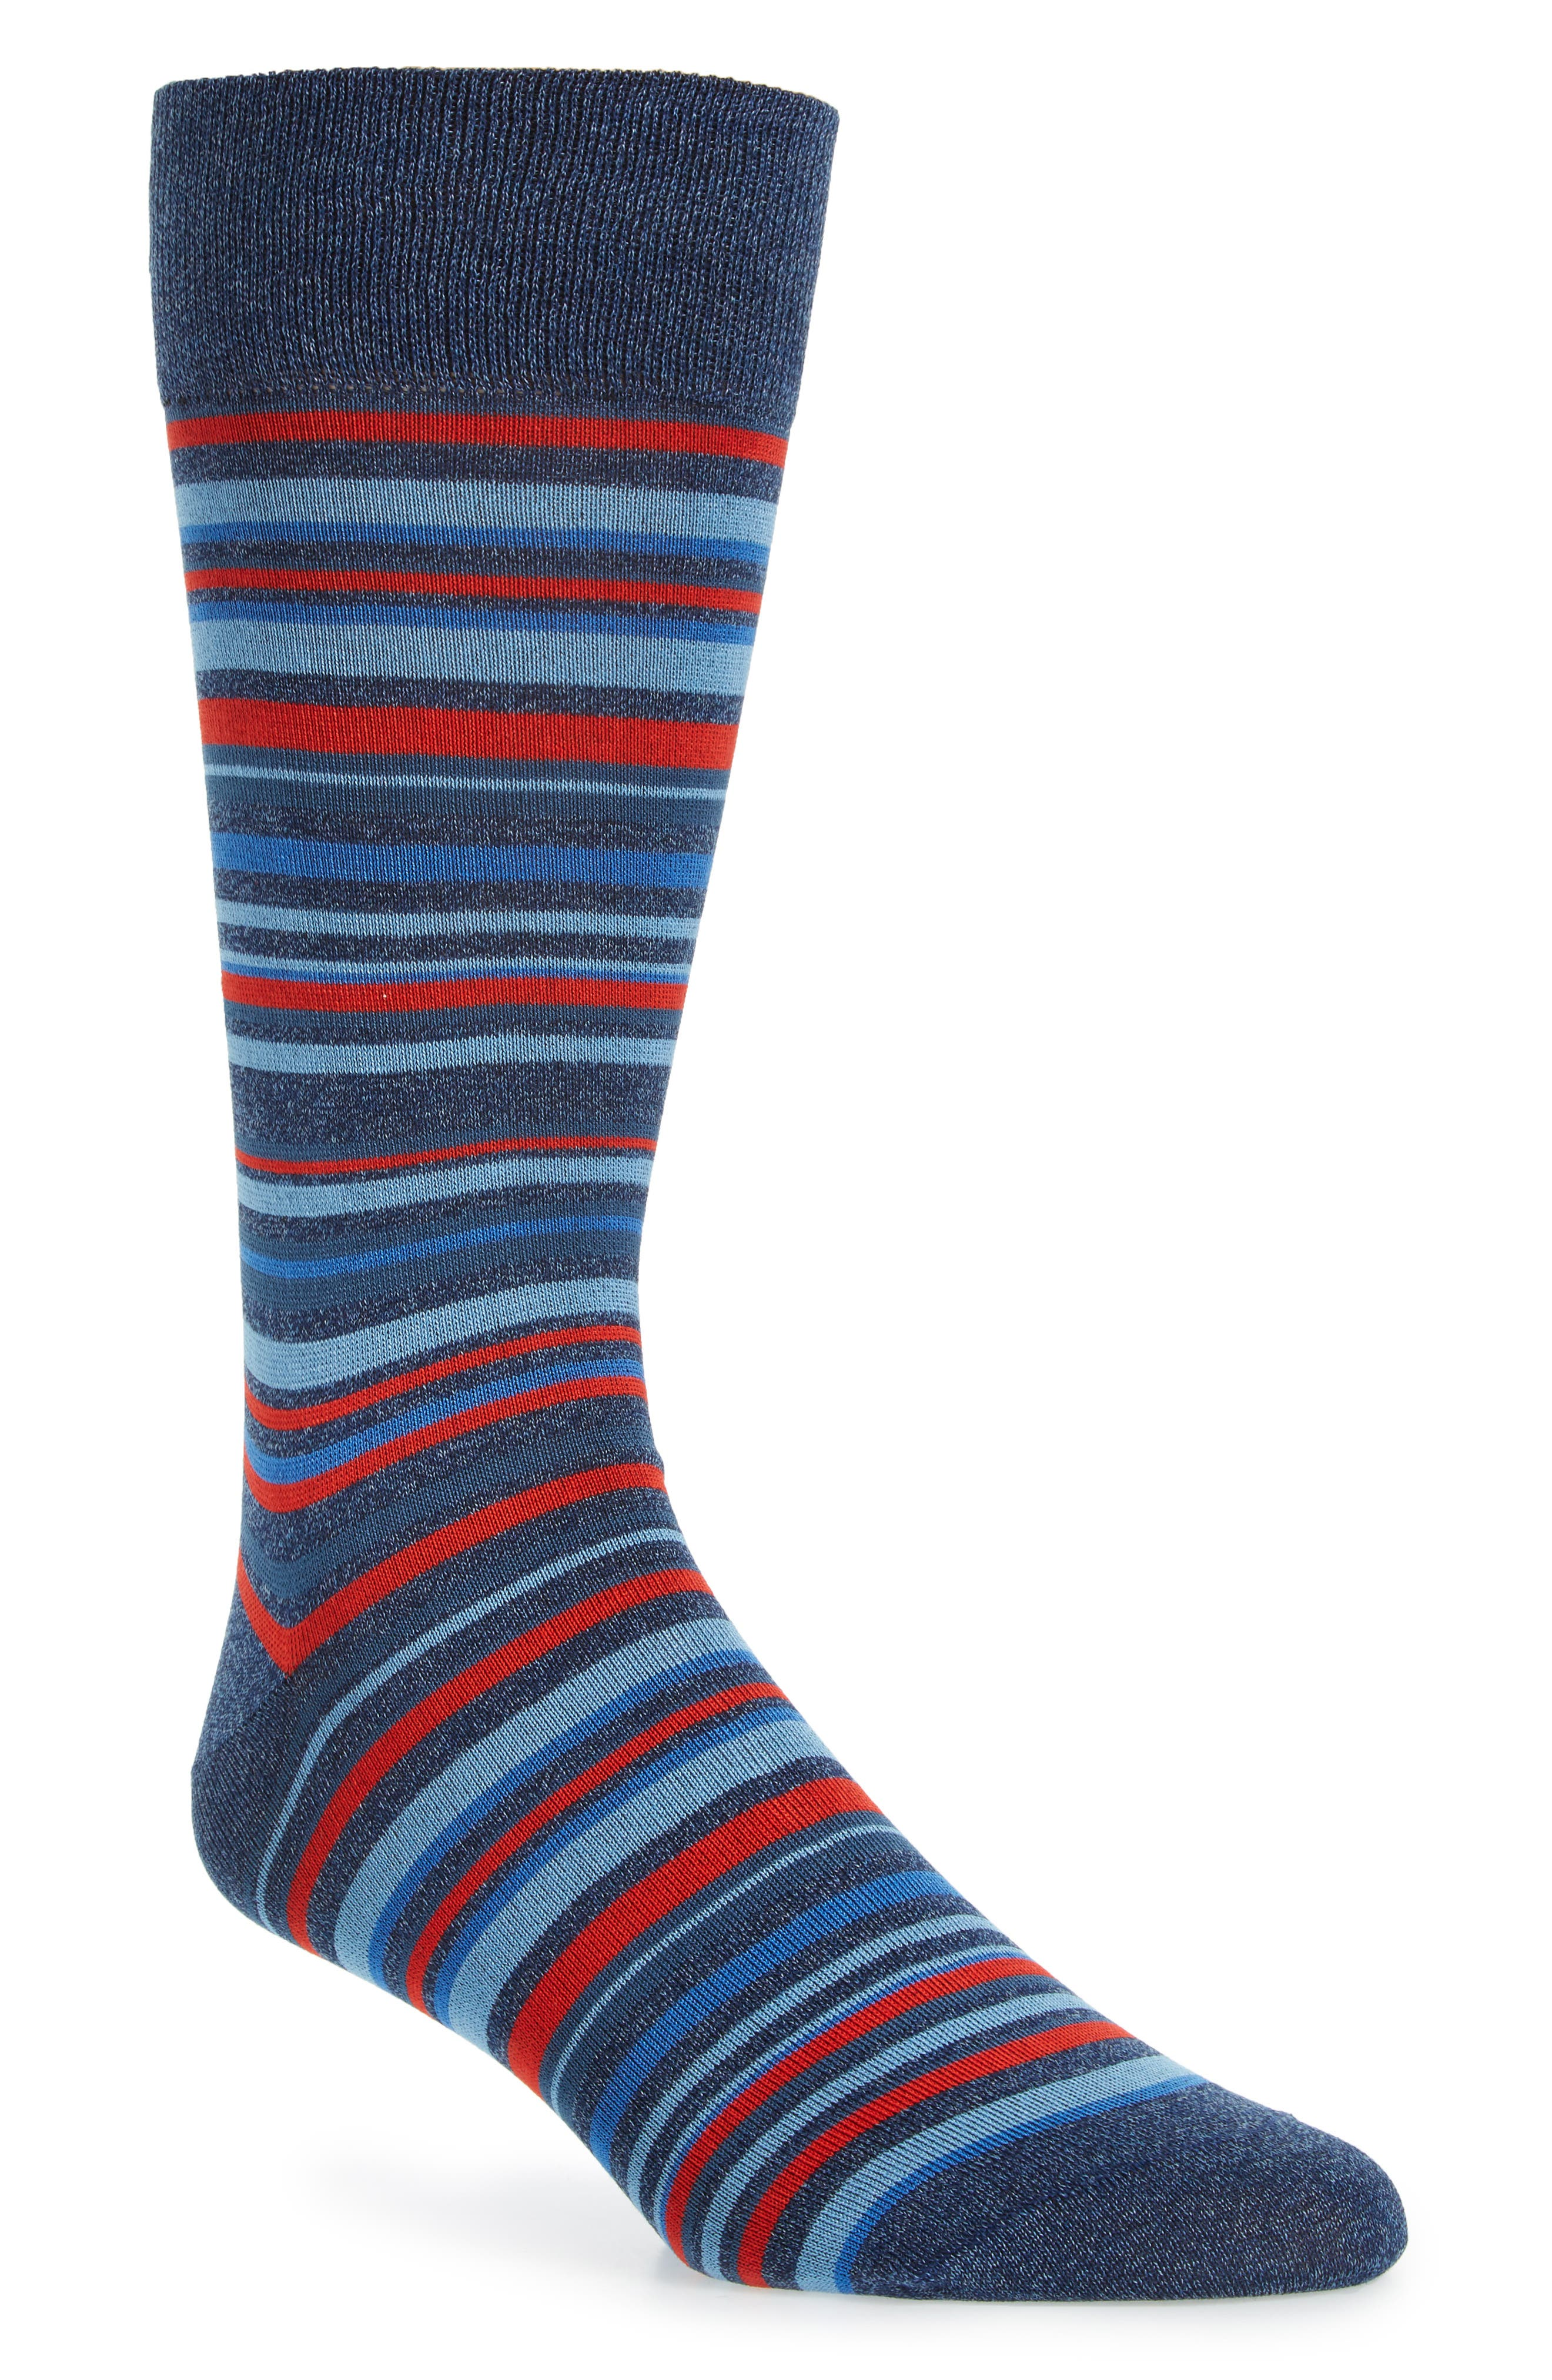 Cotton Blend Socks,                         Main,                         color, Denim